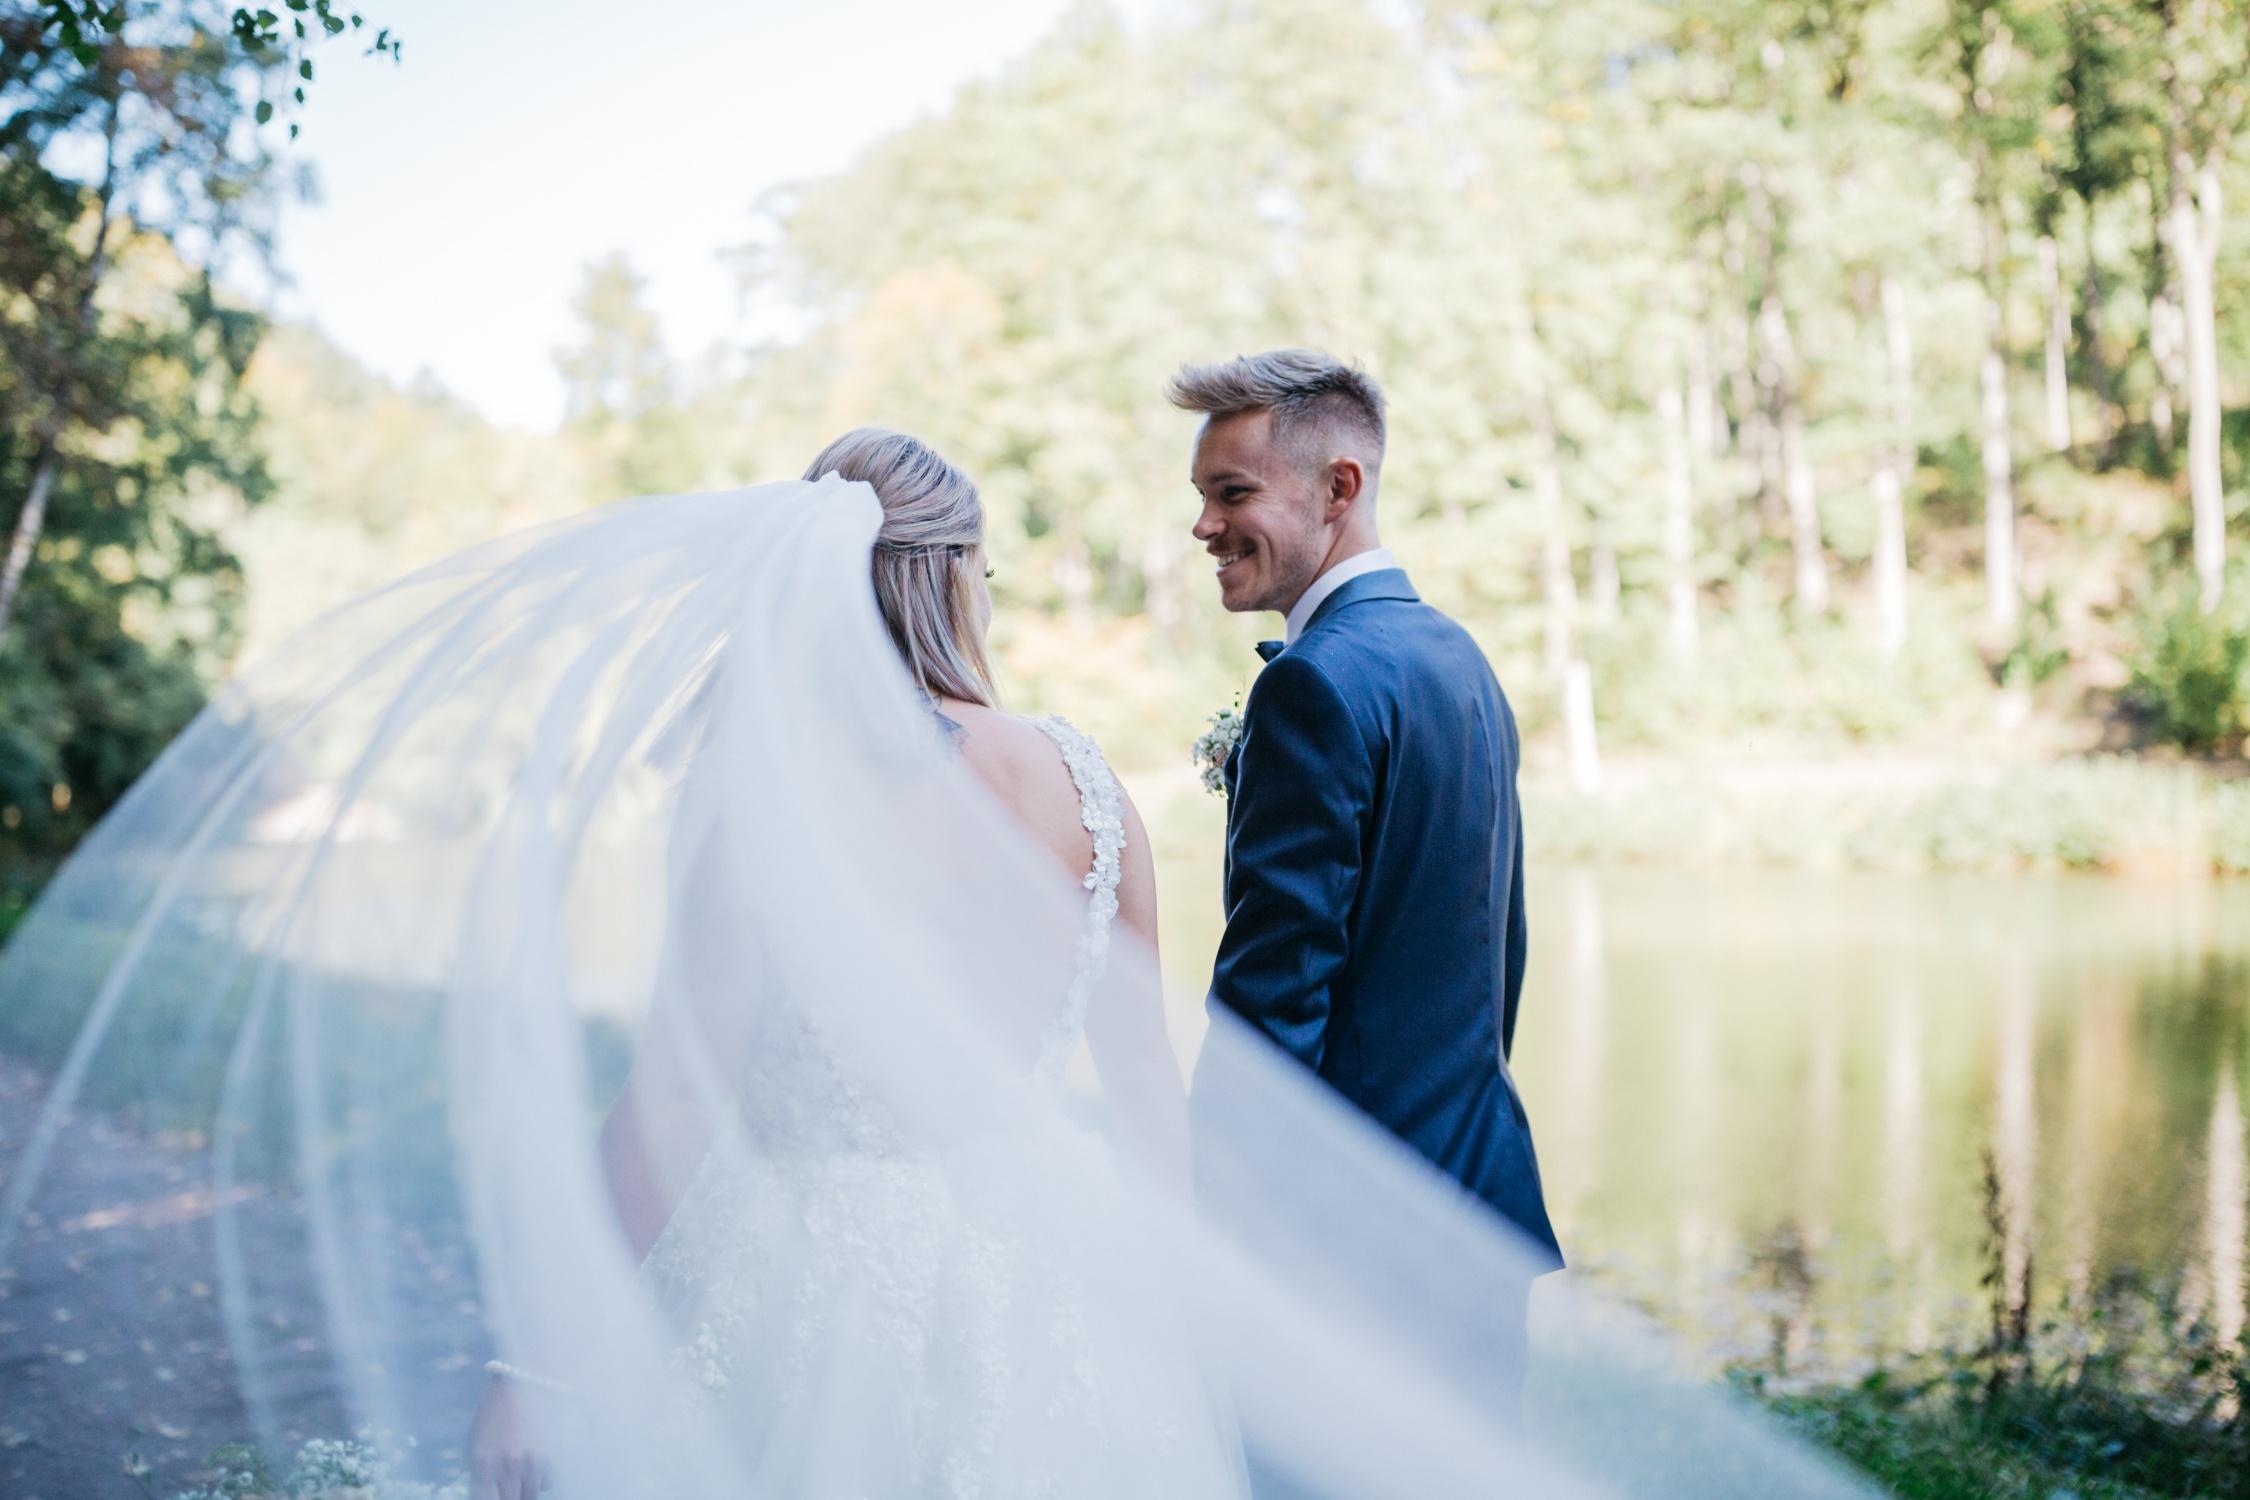 Hochzeitsreportage-Pfalz-After-Wedding-Shooting-03